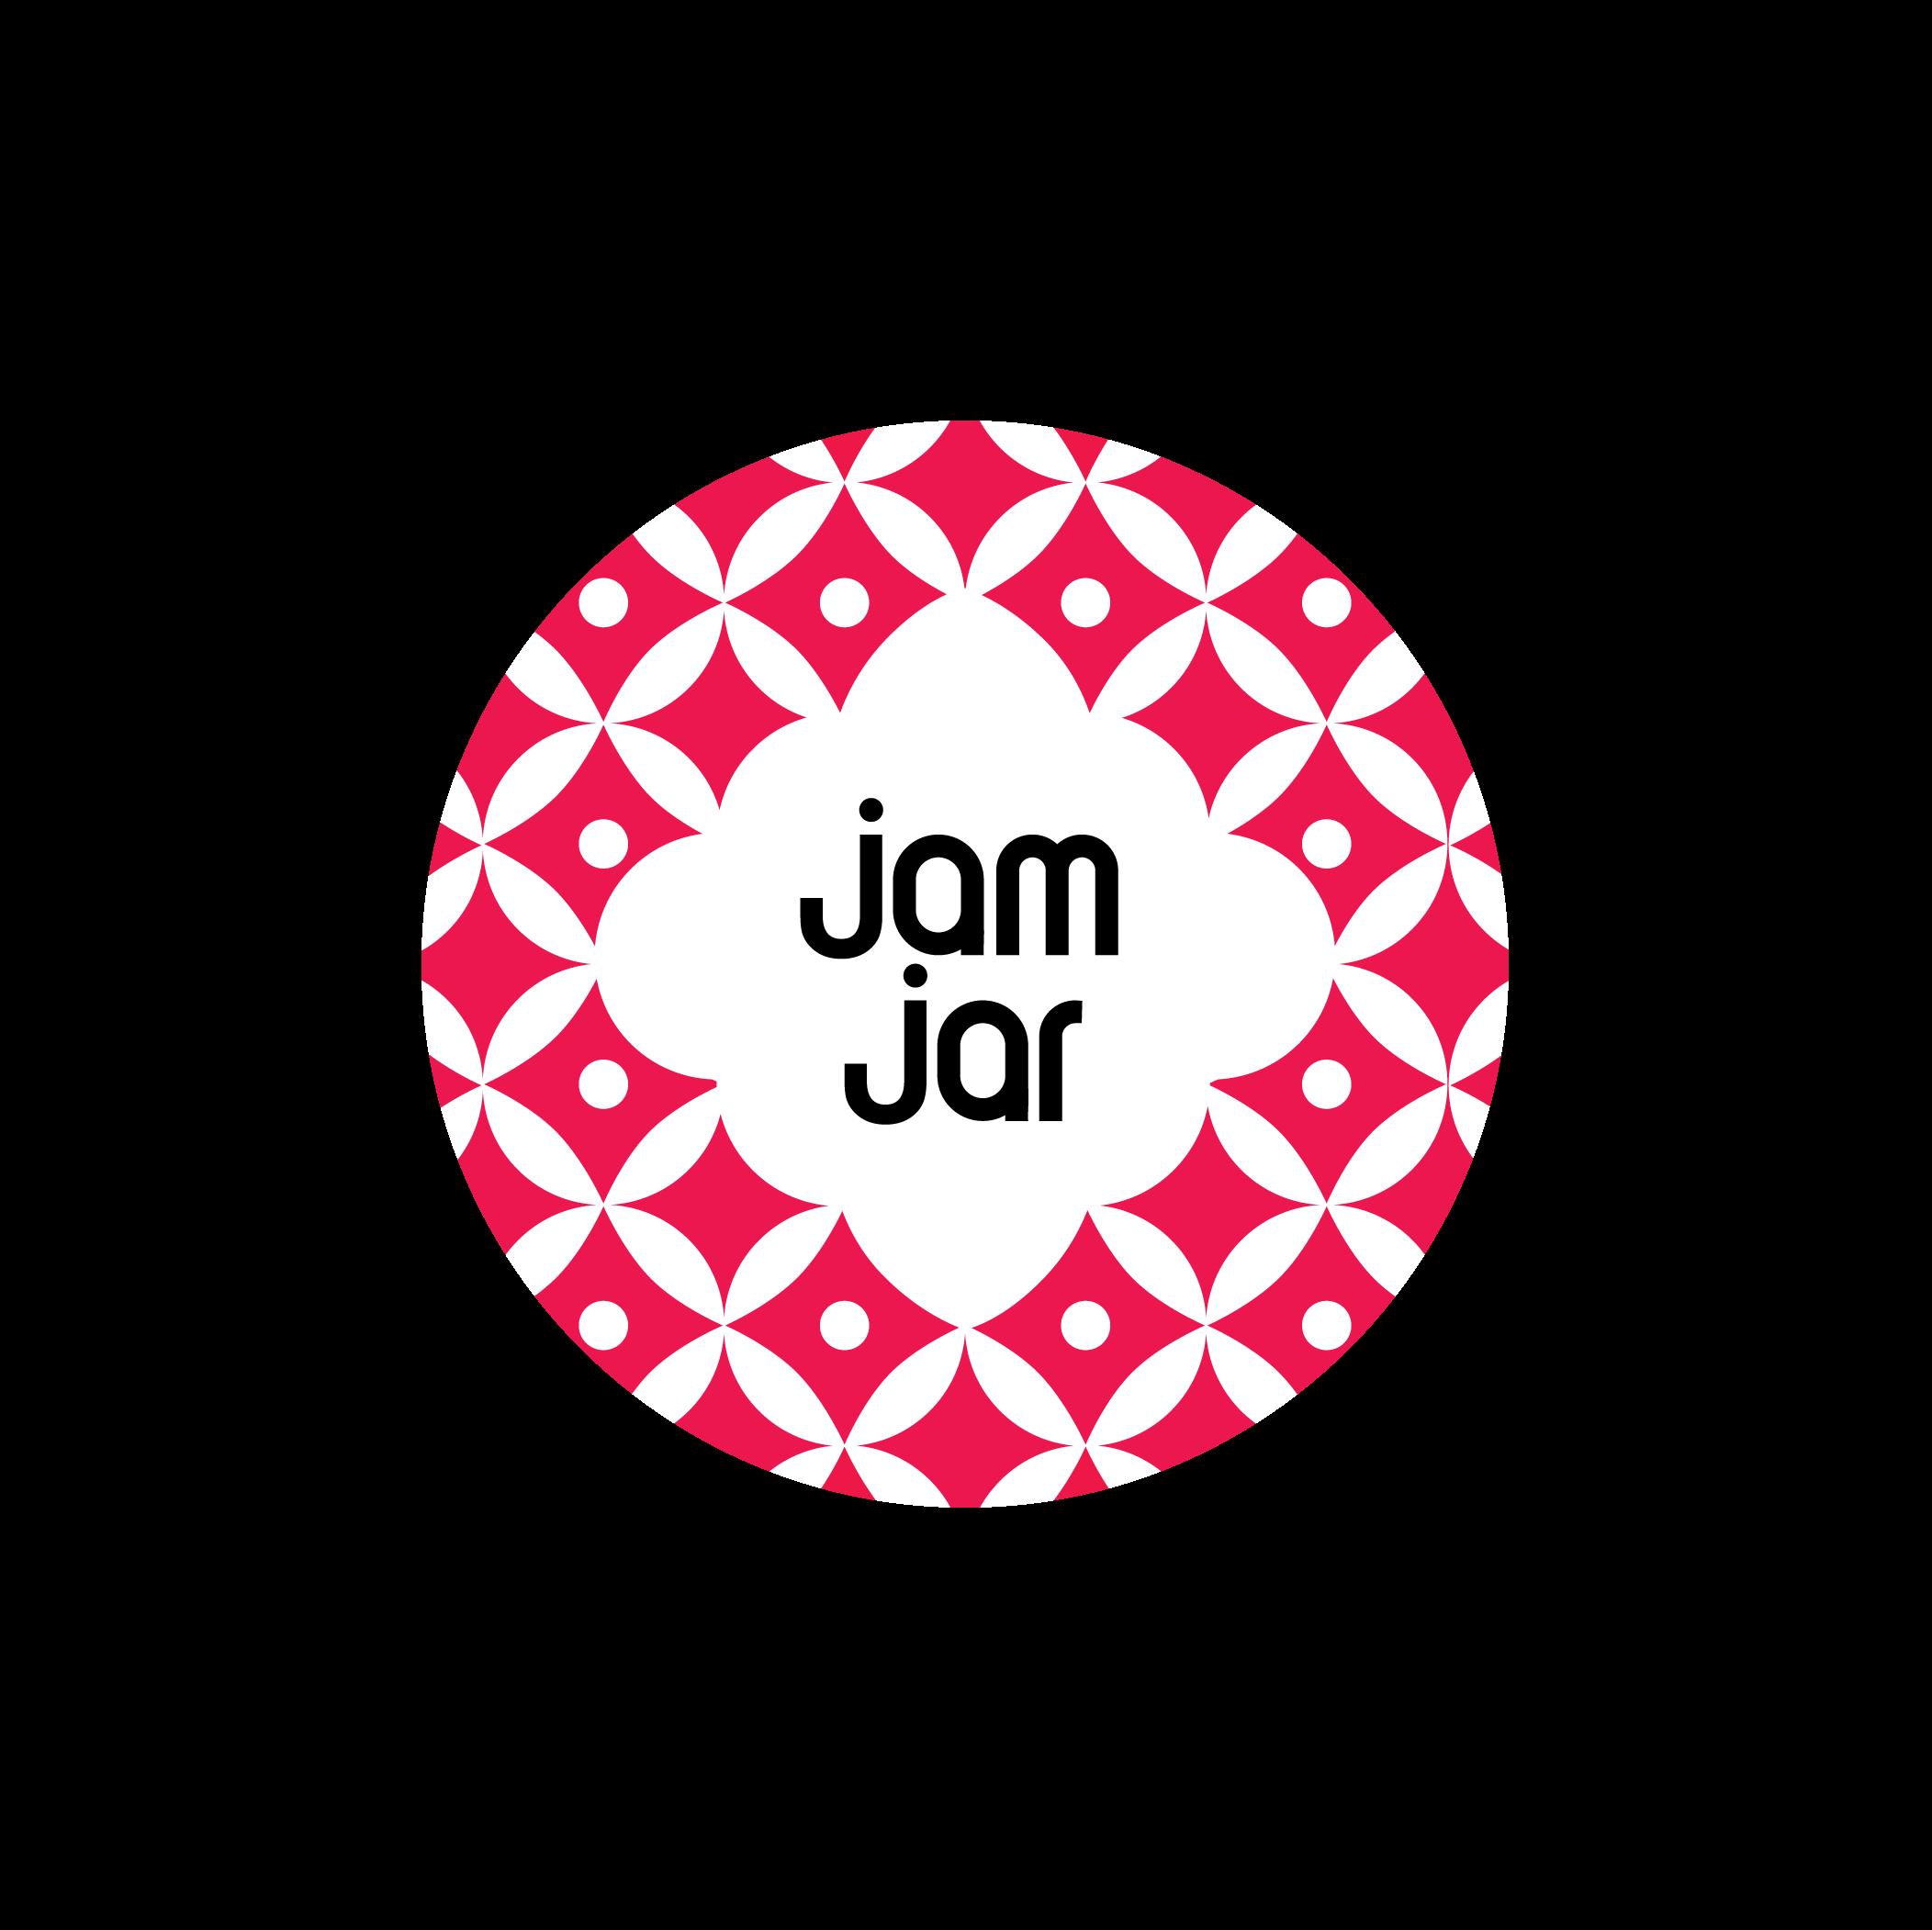 JamJar_AltLogo_2 (1).png